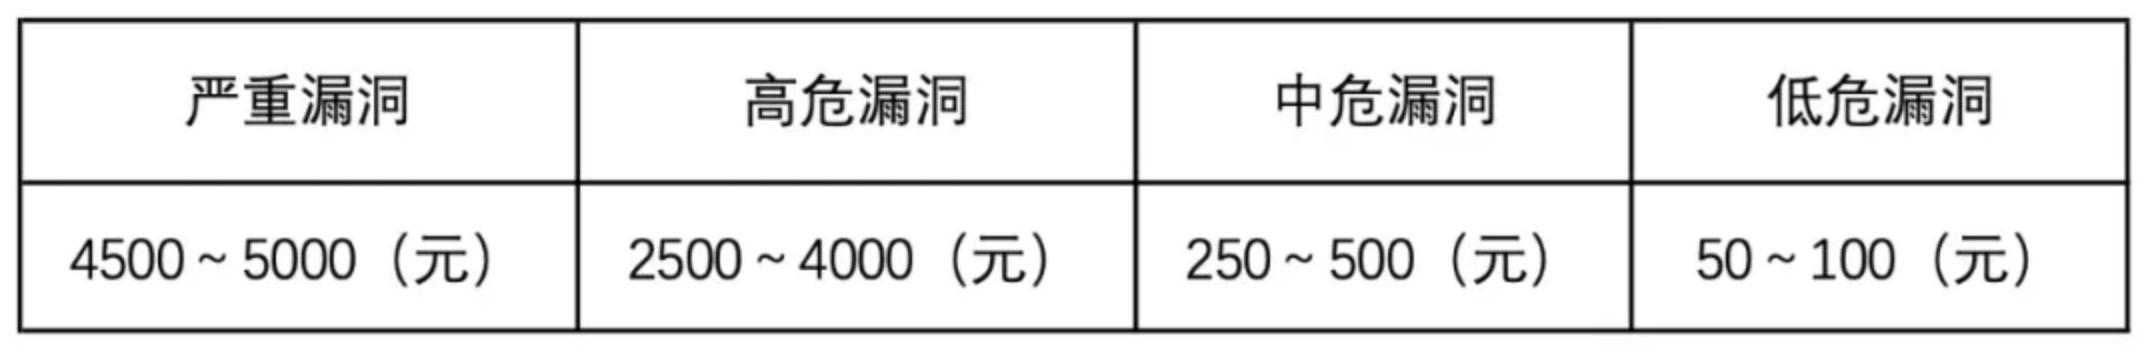 https://momo-mmsrc.oss-cn-hangzhou.aliyuncs.com/img-cddbfb4a-6b8f-3914-8e07-fae8bc13905c.jpeg